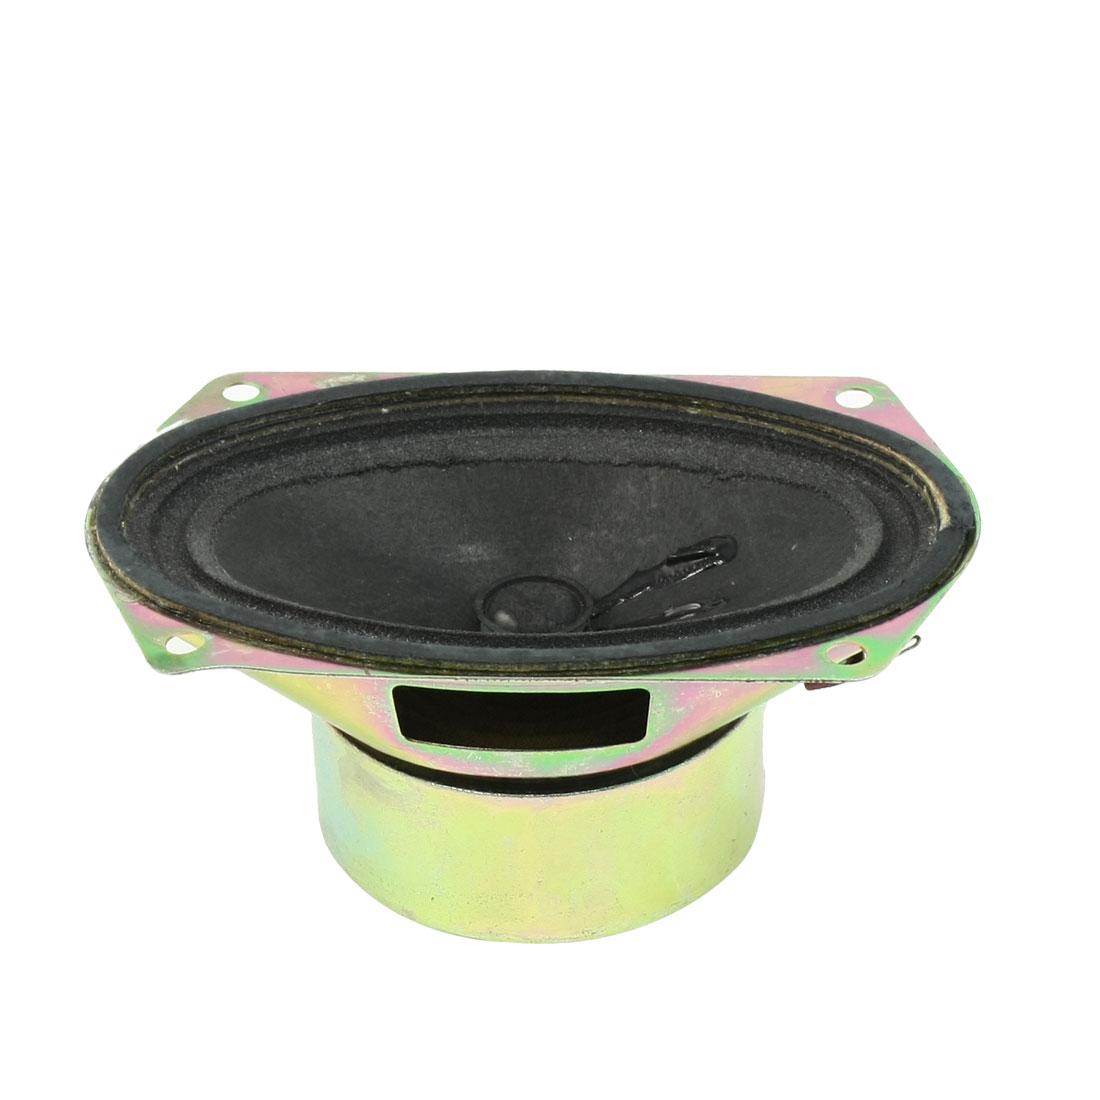 128mm x 78mm Internal Magnet Speaker Antimagnetic Tweeter 8 Ohm 10W